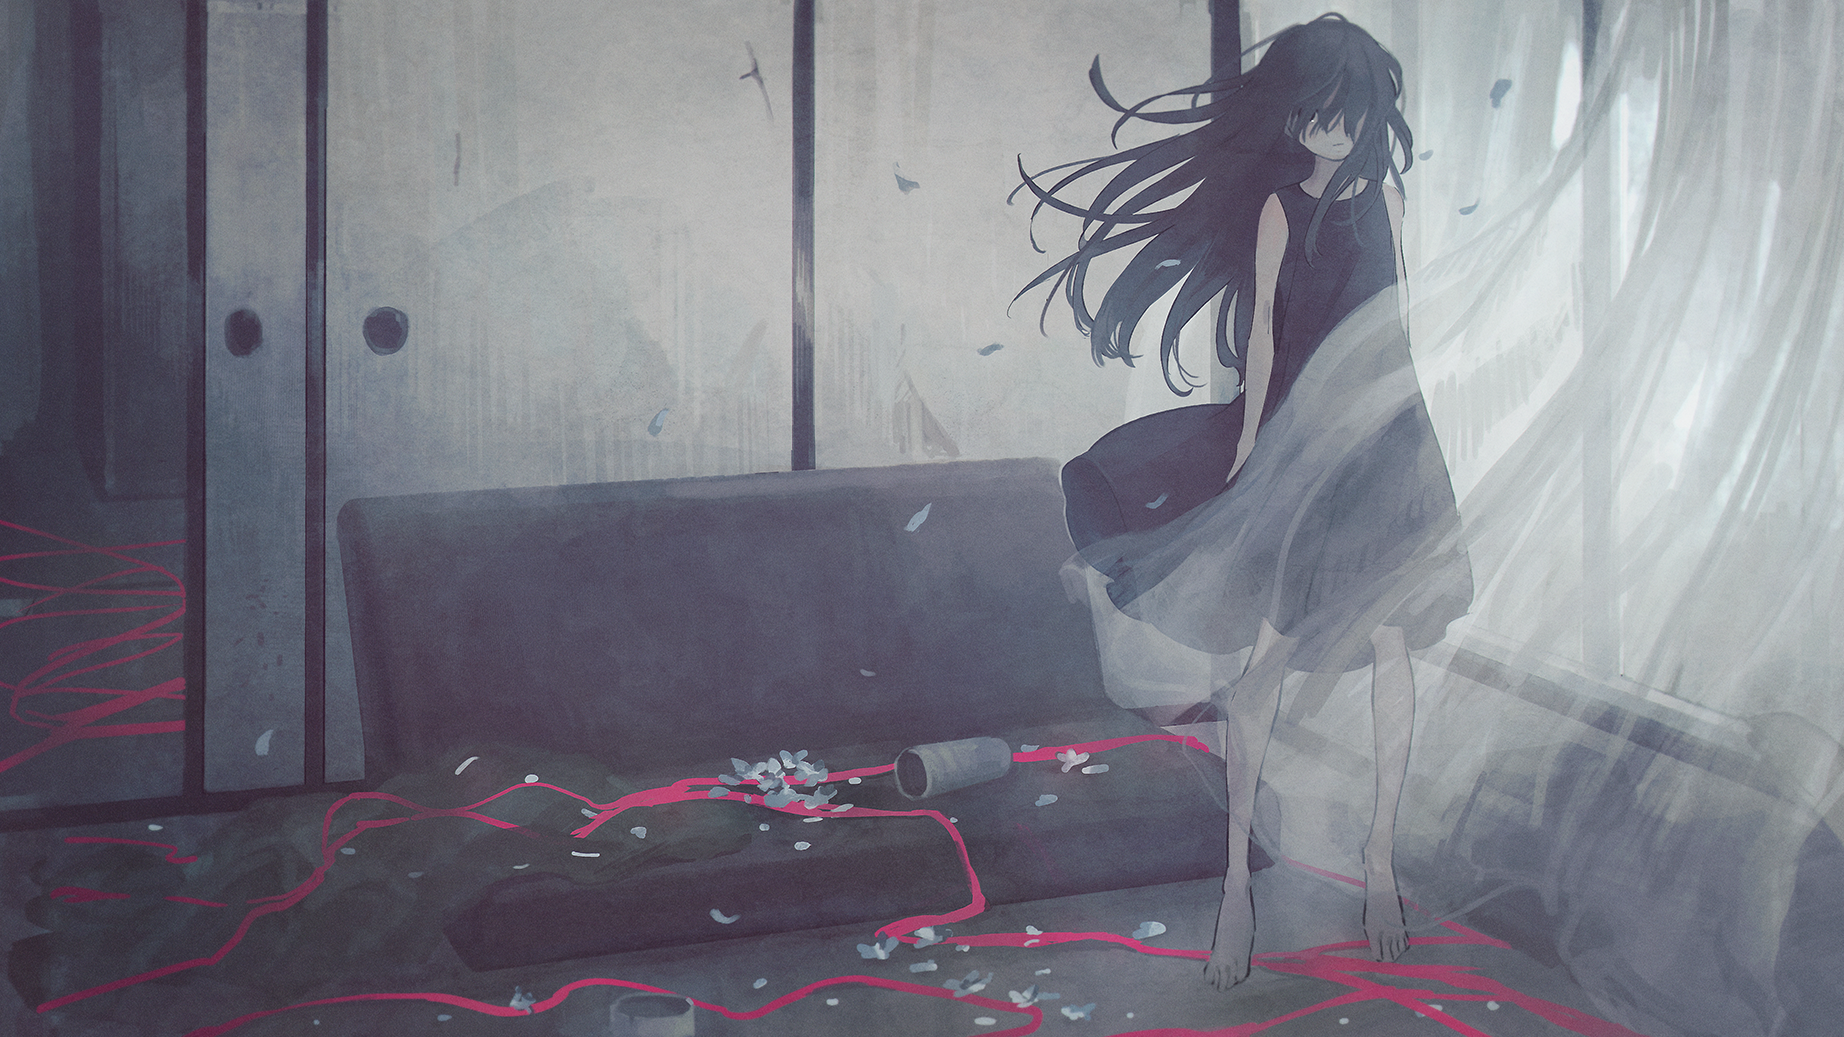 Anime Anime Girls Long Hair Black Hair Black Dress Petals Curtains Couch Ribbons 1844x1037